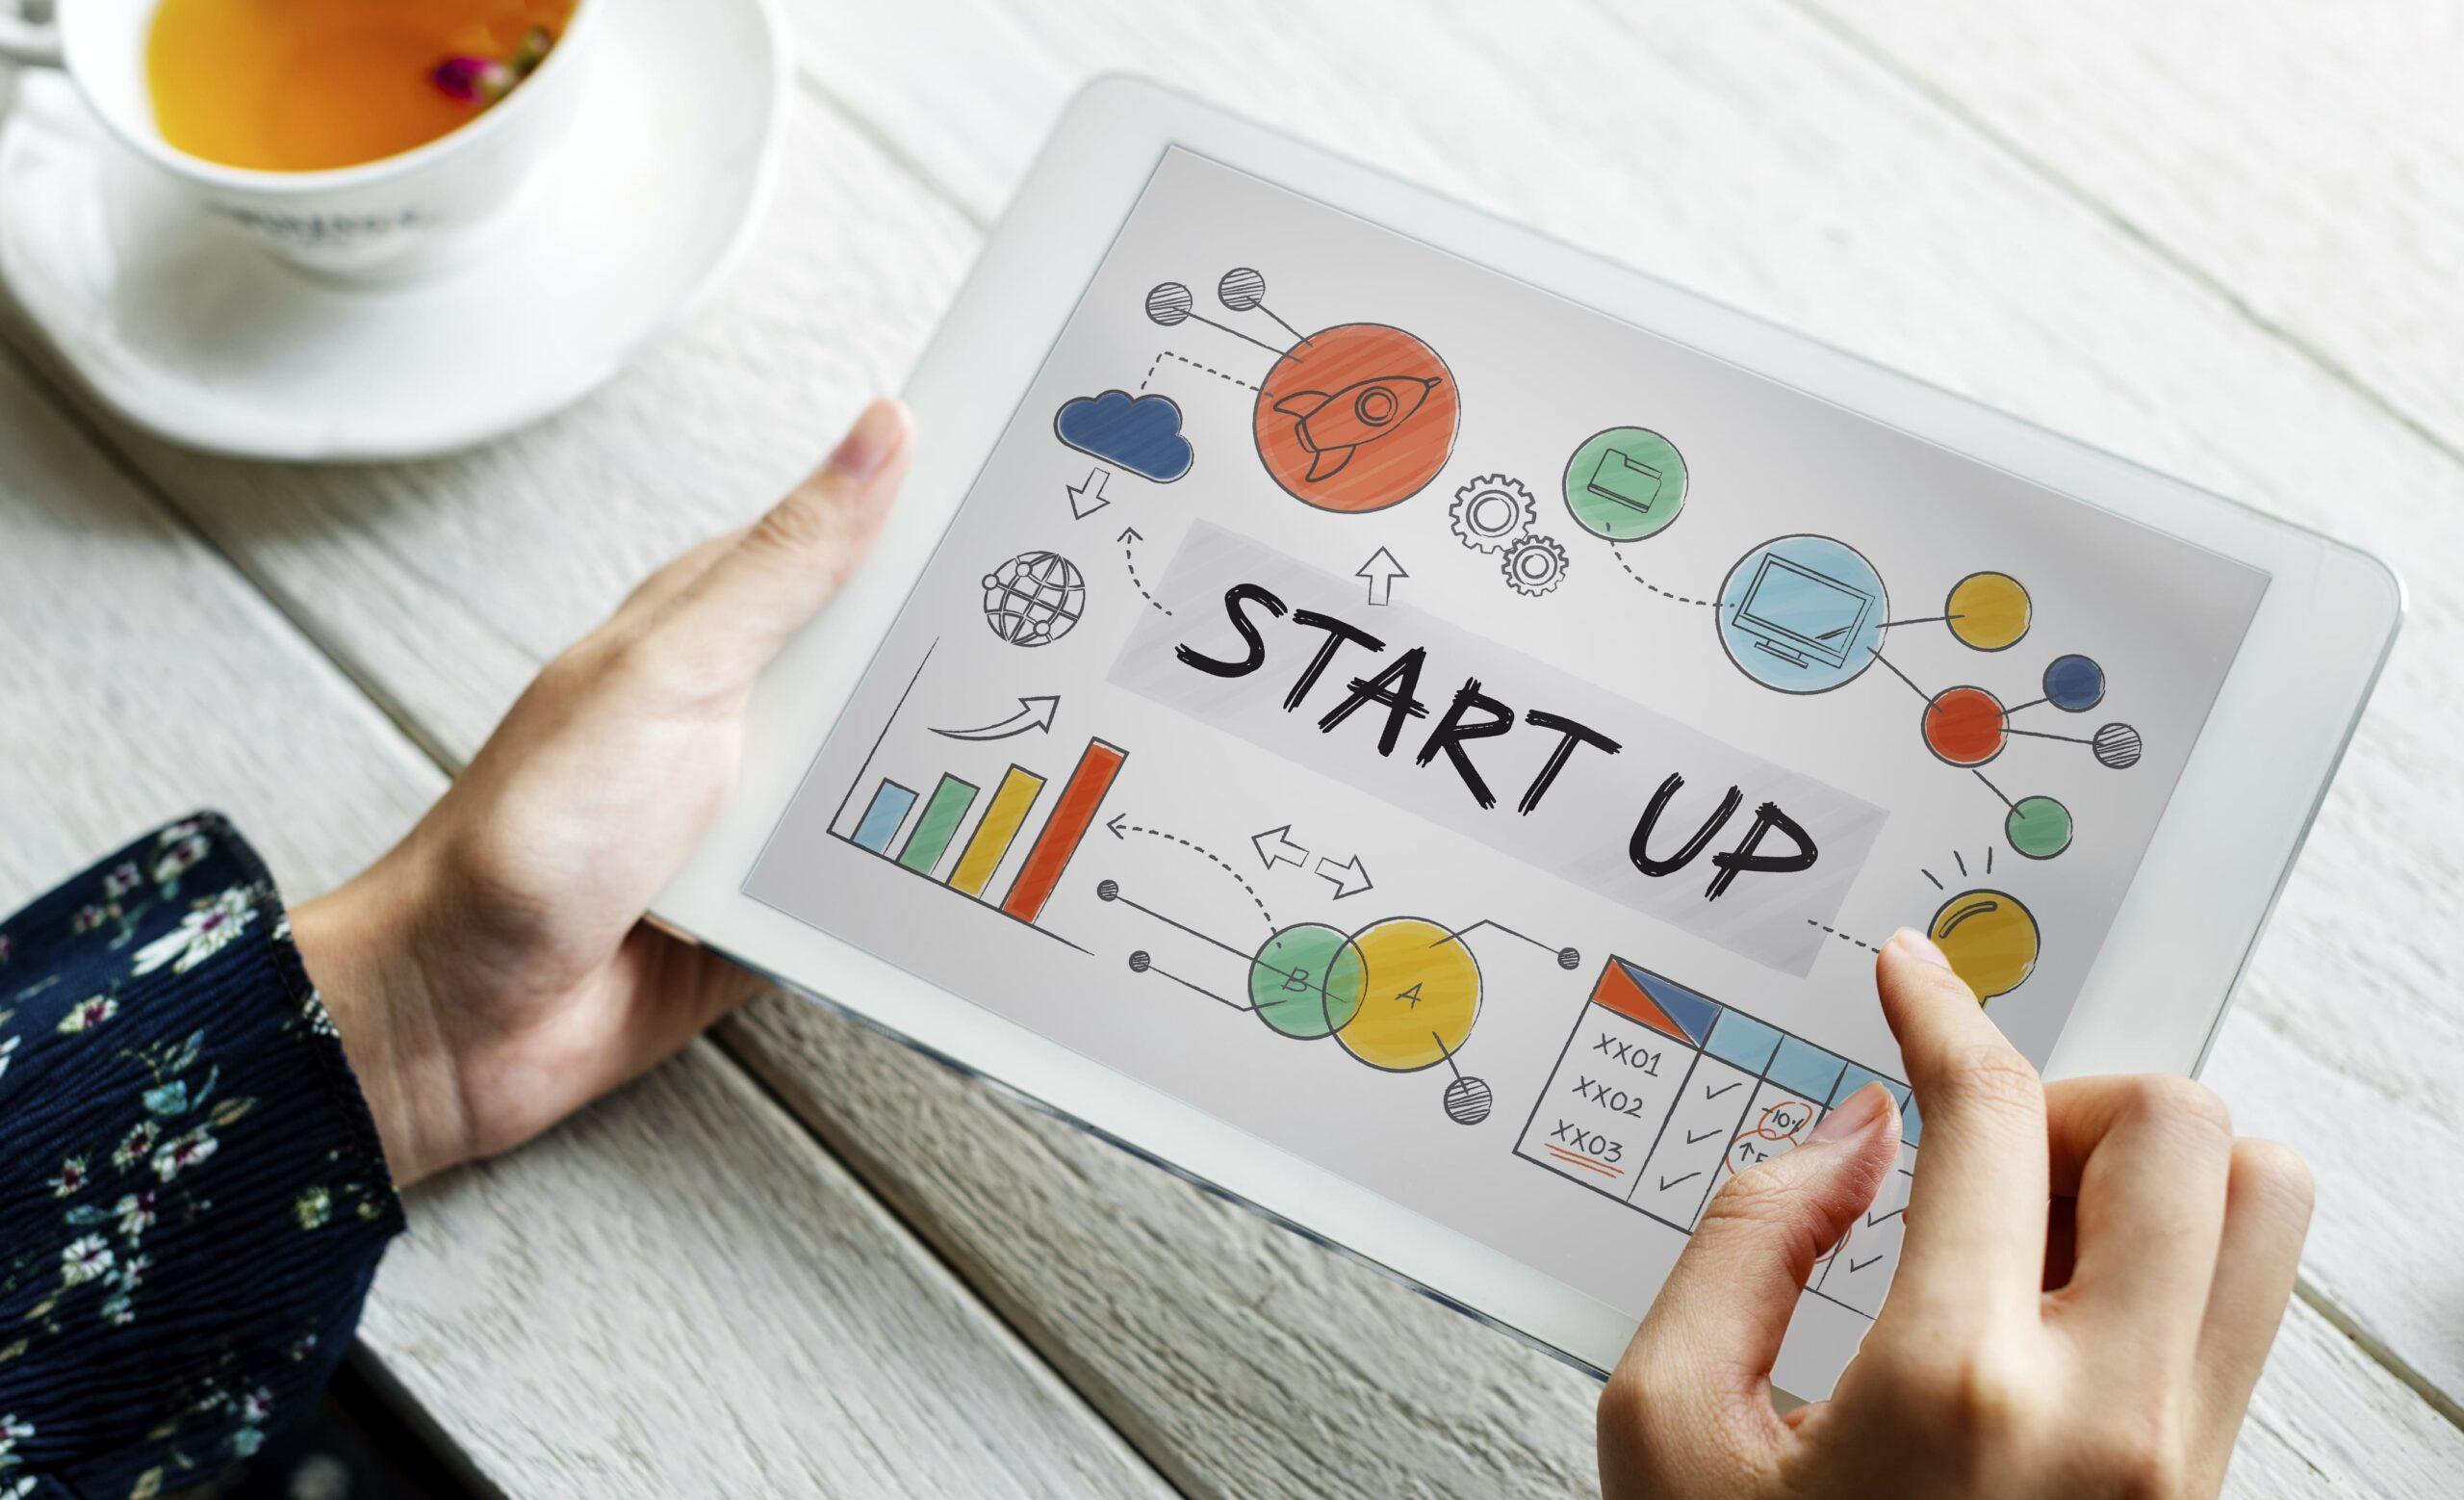 https://publiconline.com.br/wp-content/uploads/2021/06/como-nasce-uma-startup-public-online-min-min-scaled.jpg